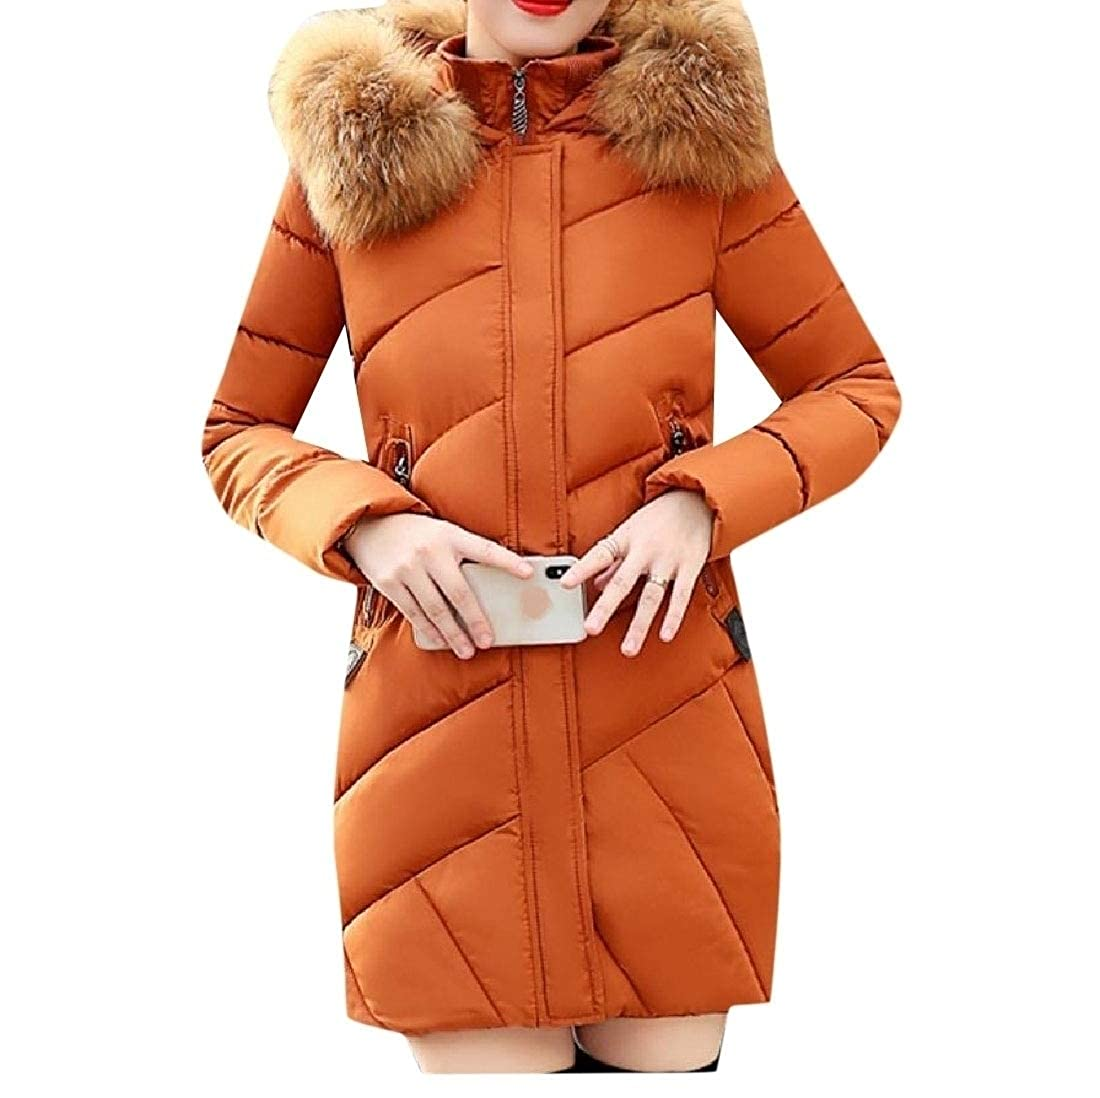 YUNY Womens Topcoat Hooded Faux-Fur Trim Casual Wadded Jacket Caramel XL